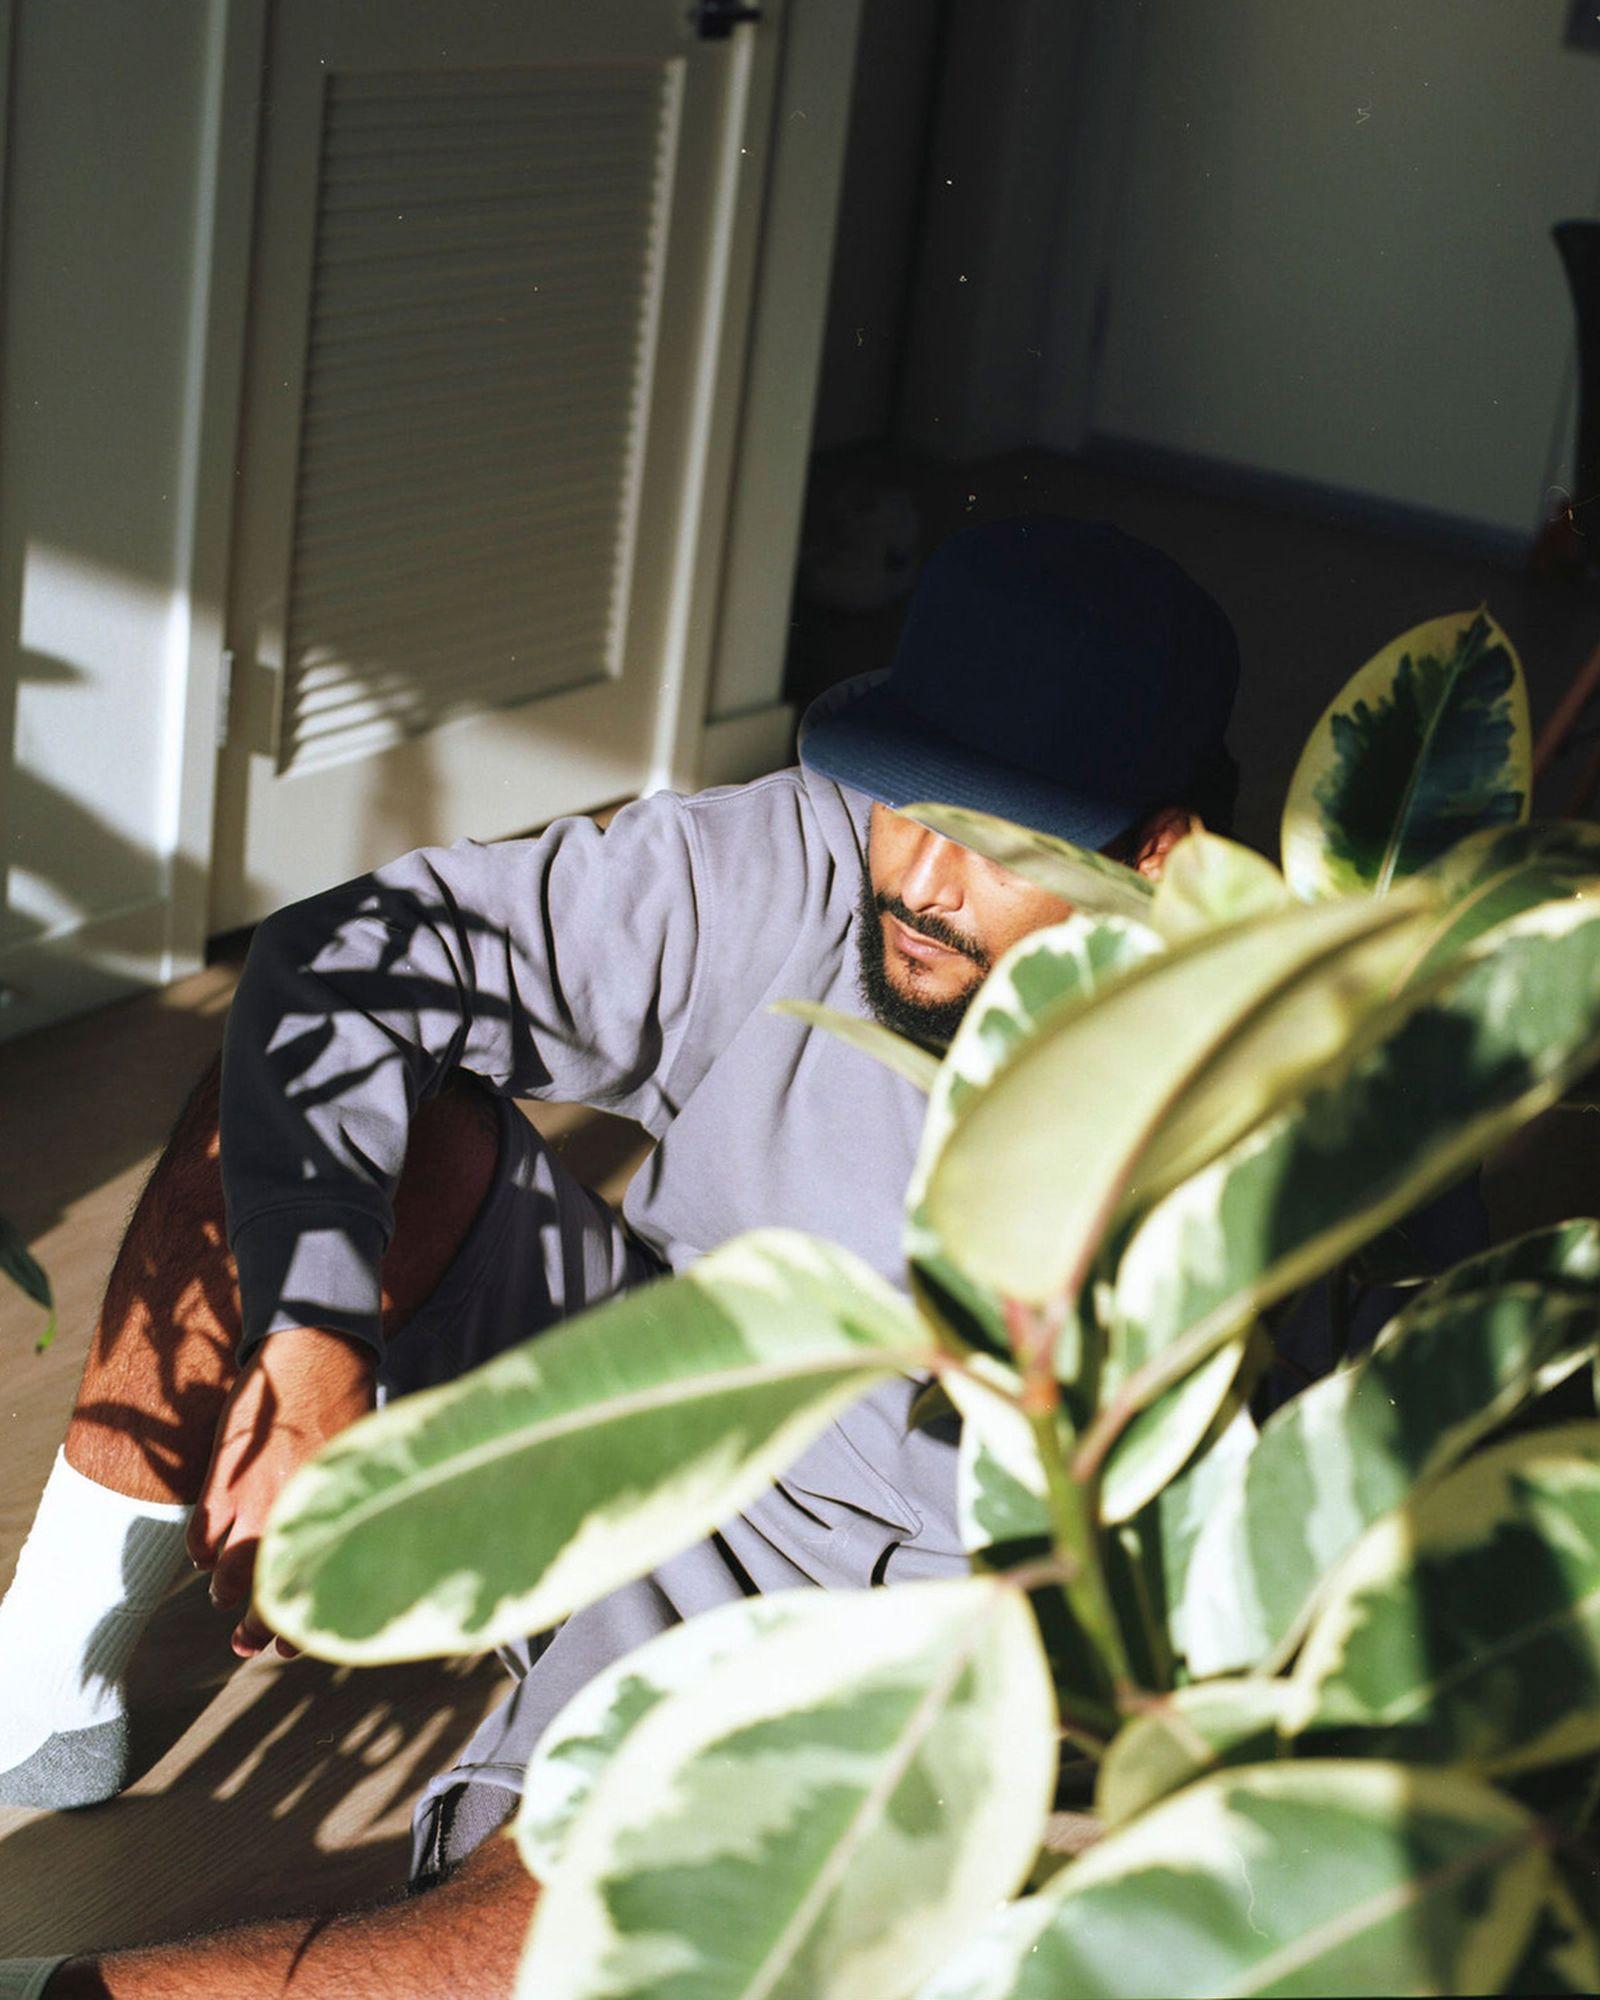 plant-man-p-hm-blank-staples-new-011